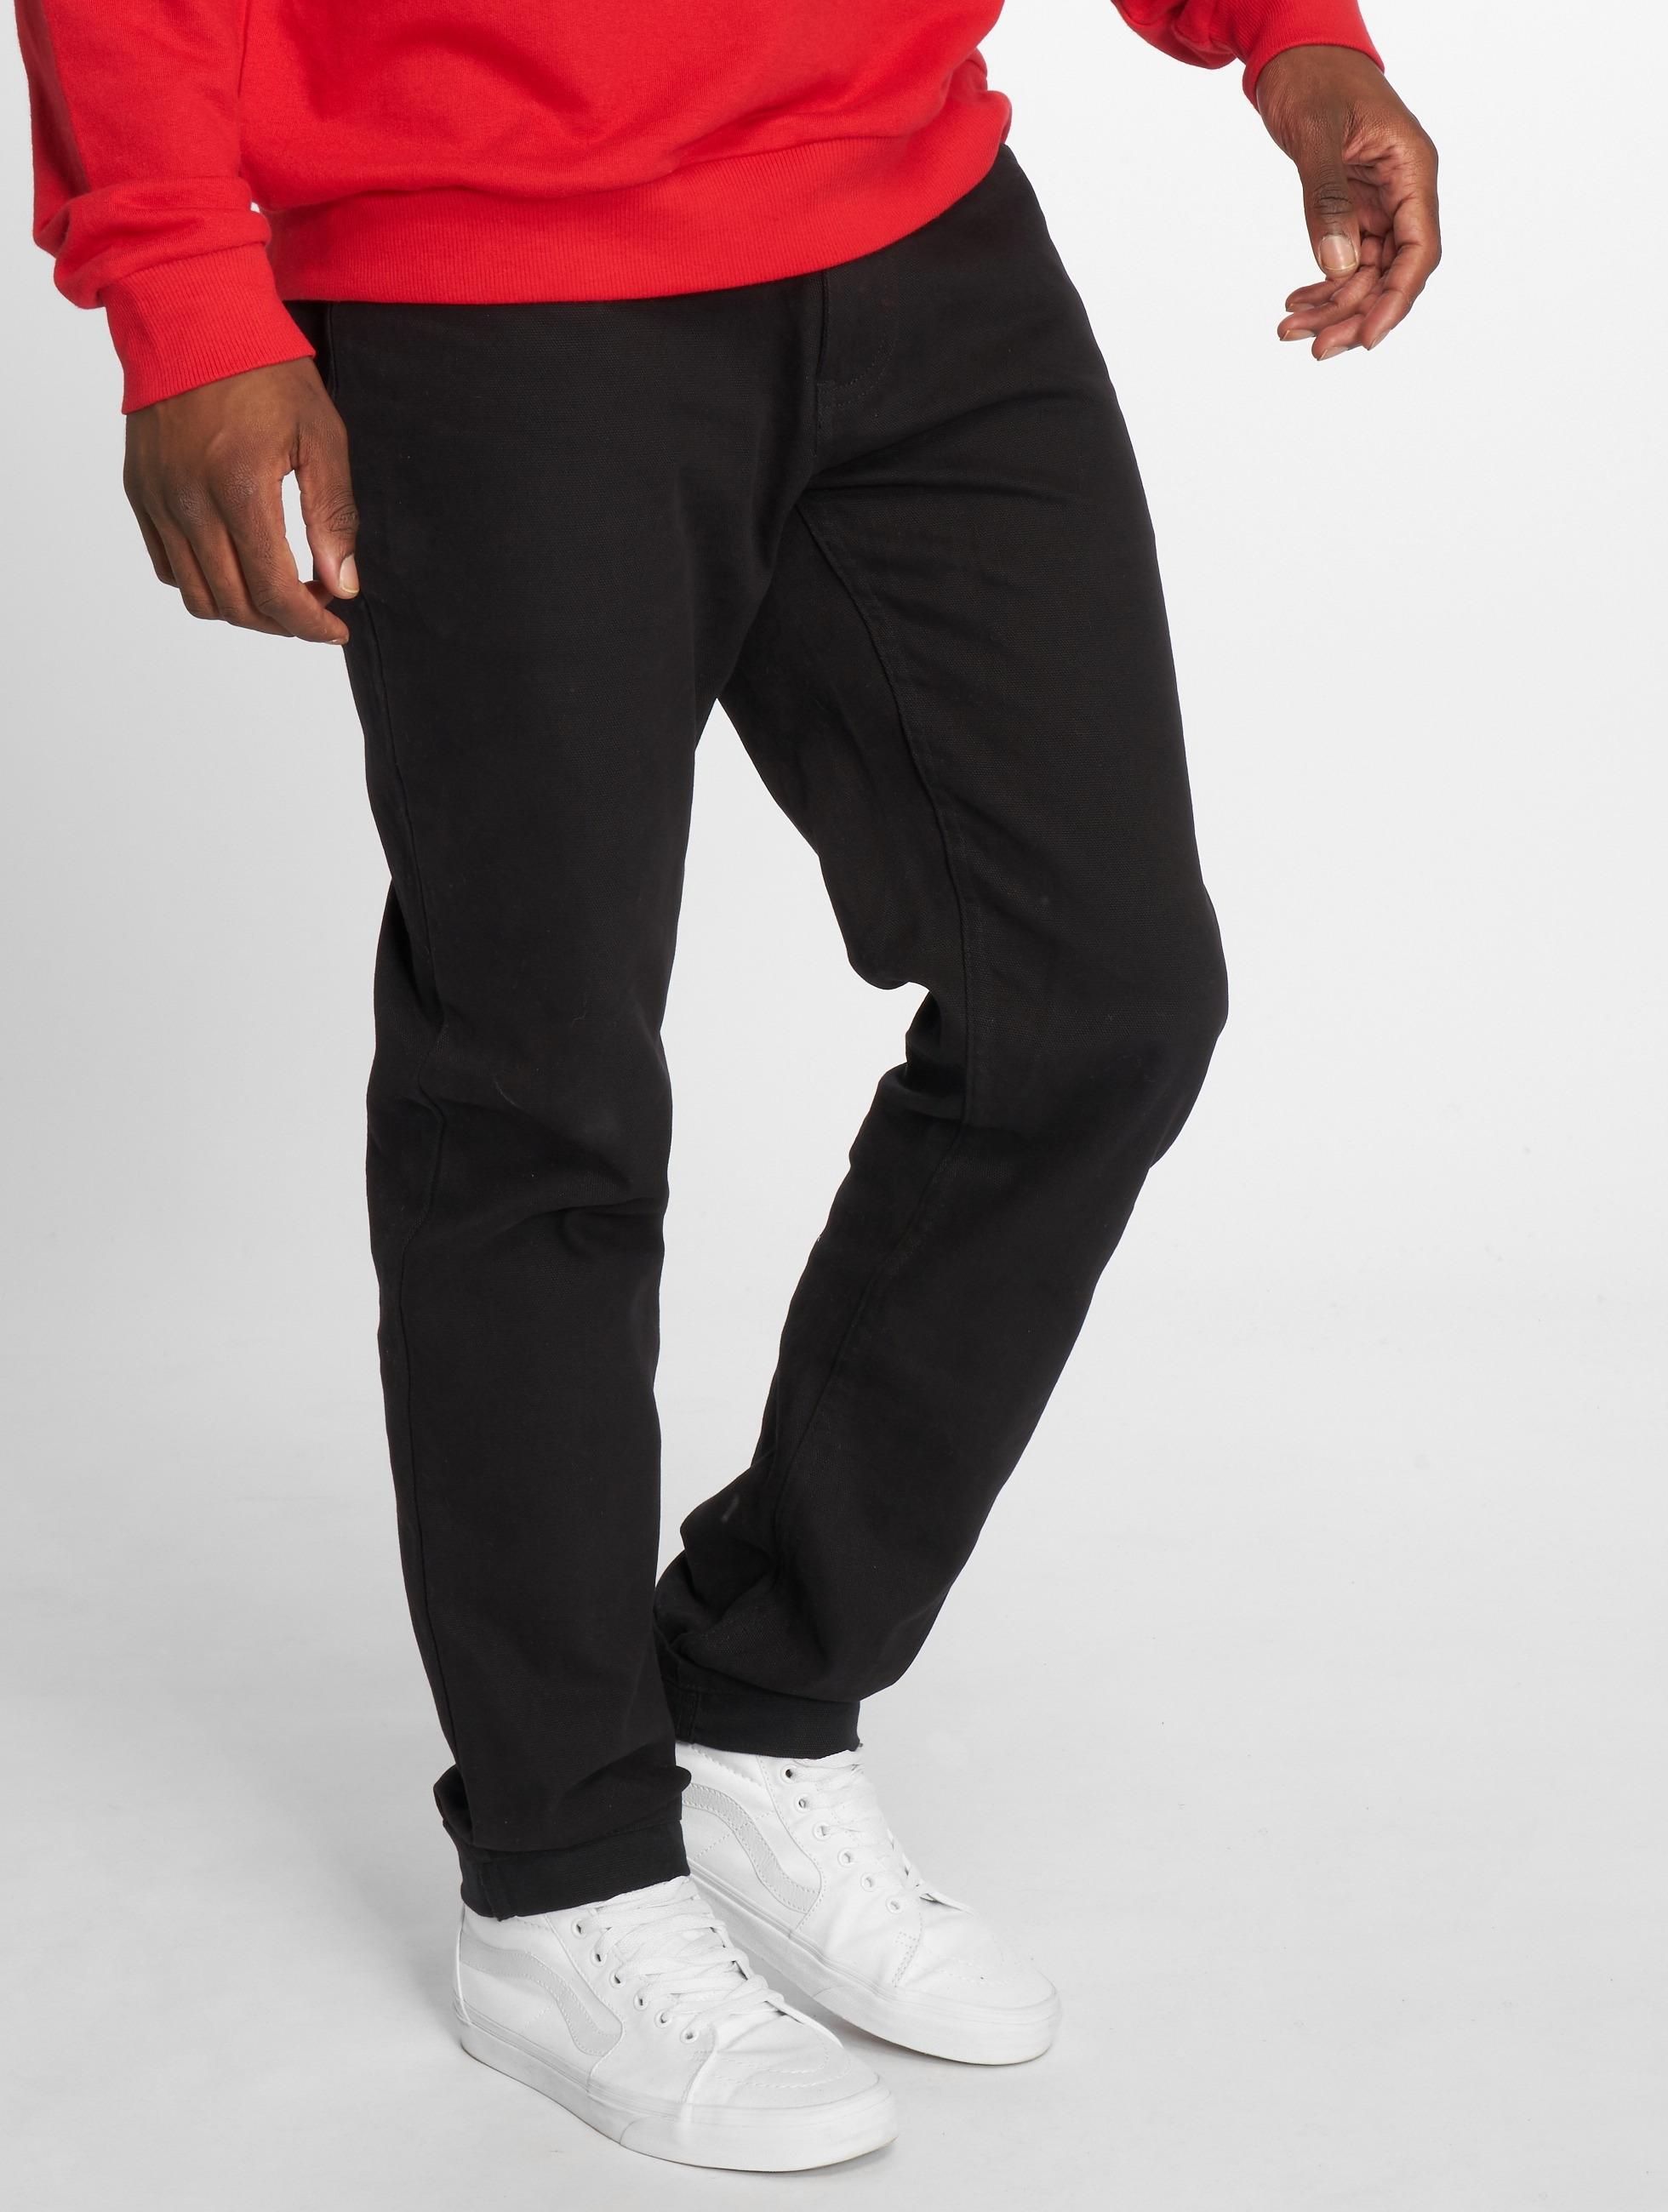 dickies herren skinny jeans louisiana in schwarz 103069. Black Bedroom Furniture Sets. Home Design Ideas